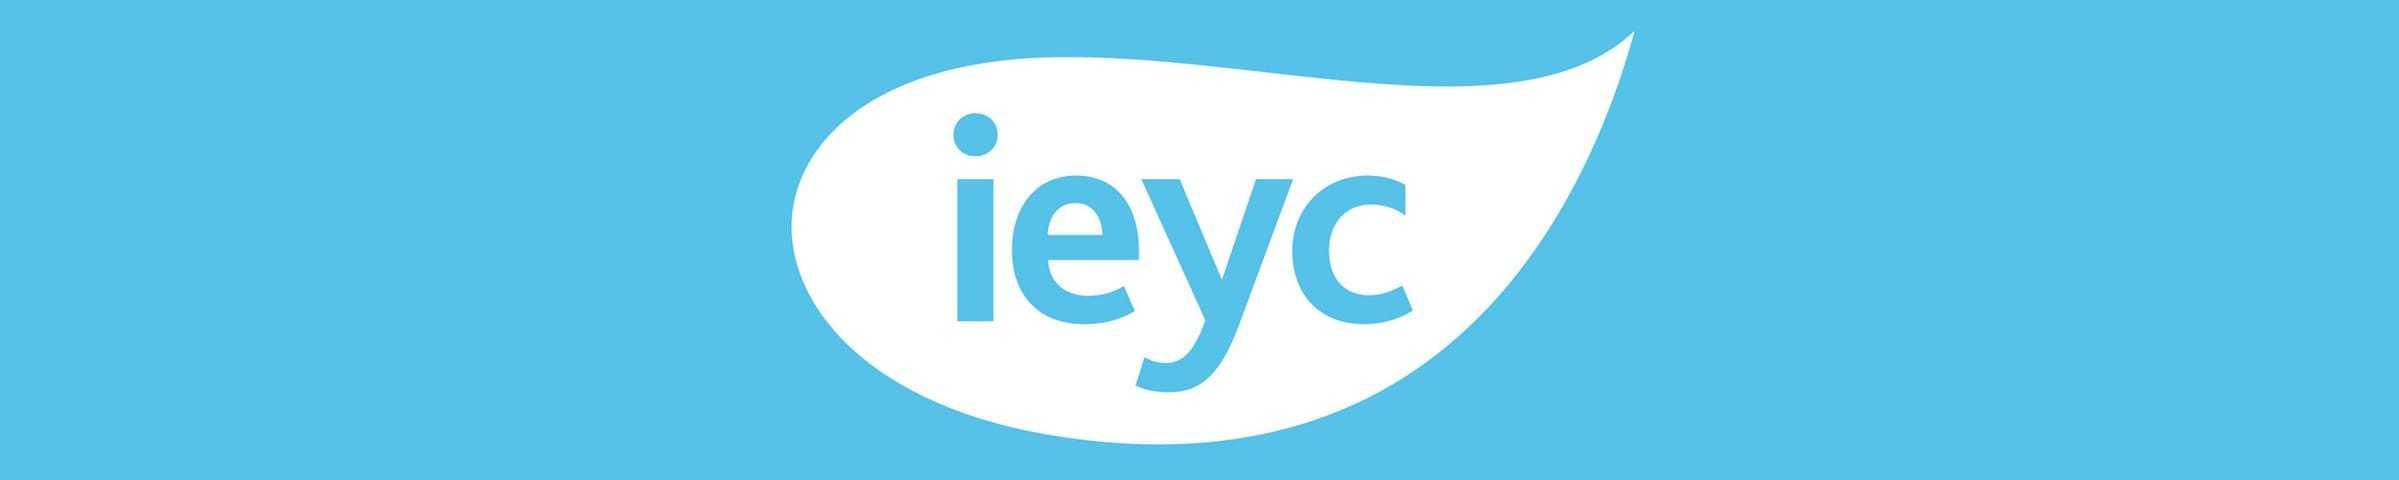 IEYC - International Earl Years Curriculum